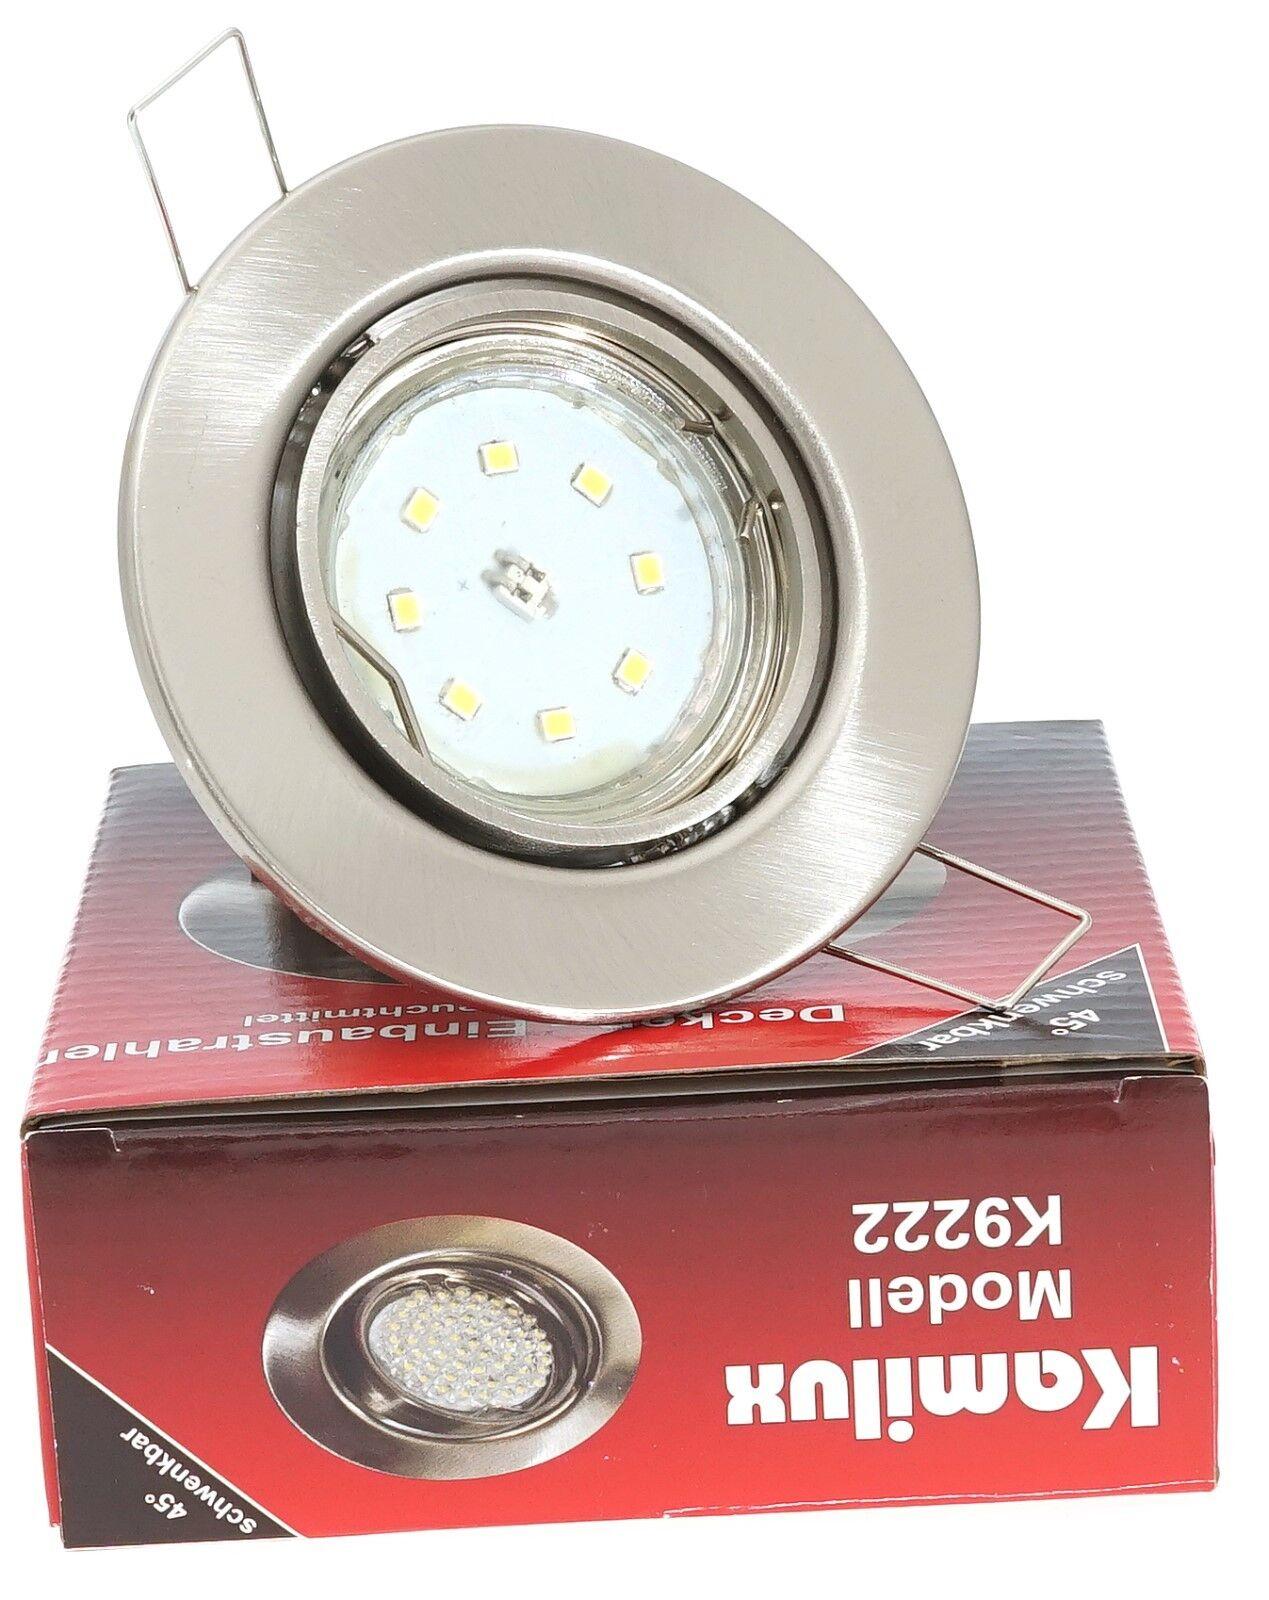 5-15er SET TOM 230V LED SMD 5W  Einbaustrahler Einbauspots Deckenspots